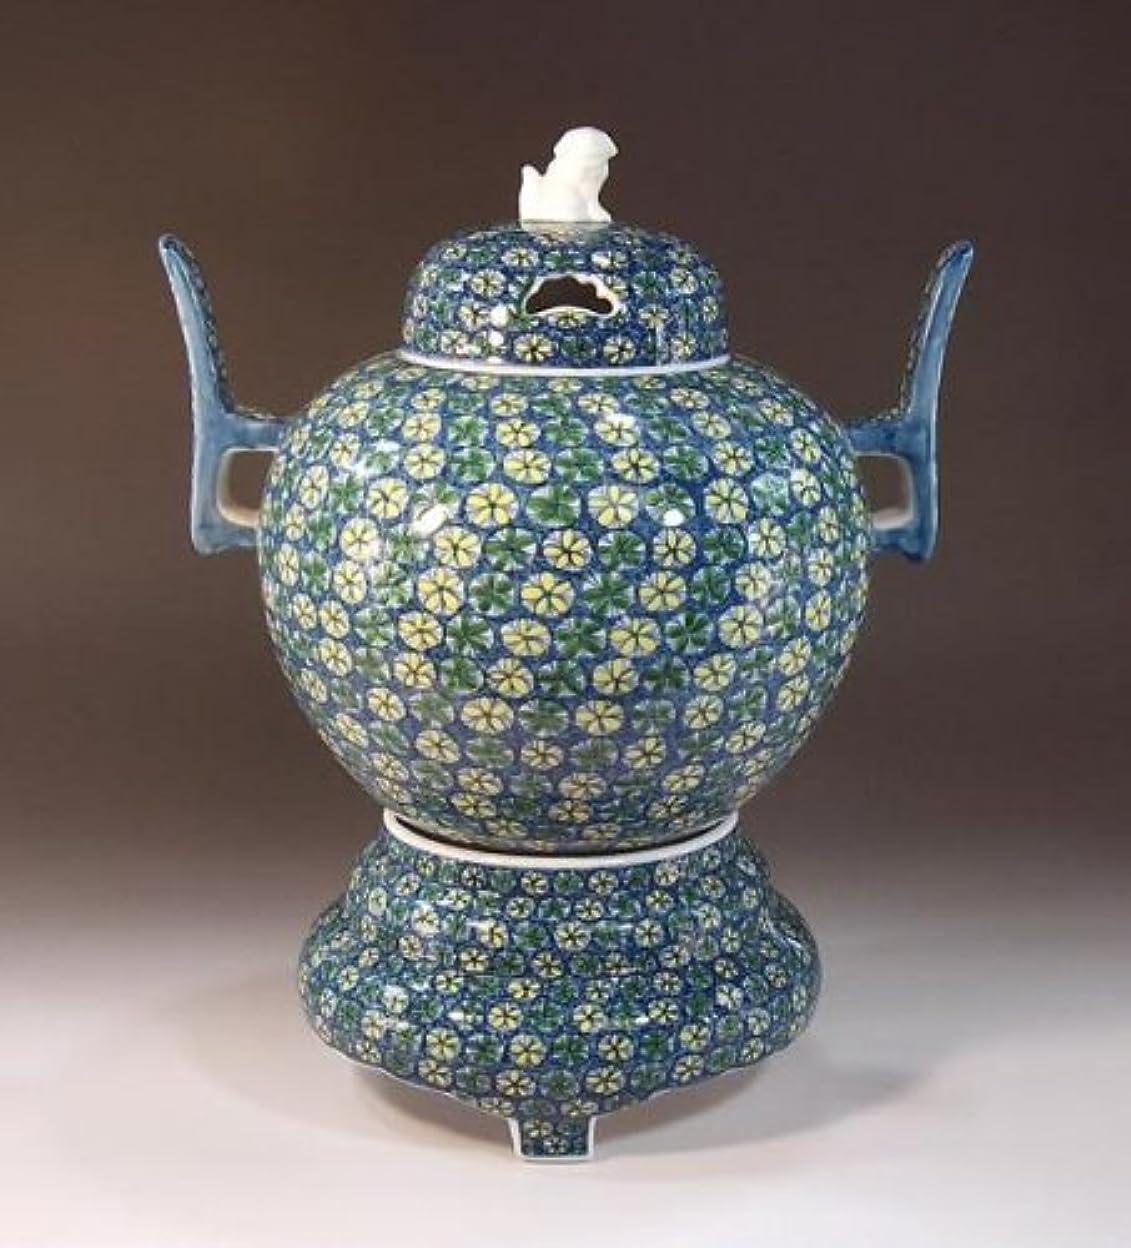 賞典型的な立派な有田焼?伊万里焼の陶器高級香炉|贈答品|ギフト|記念品|贈り物|小花紋様?陶芸家 藤井錦彩